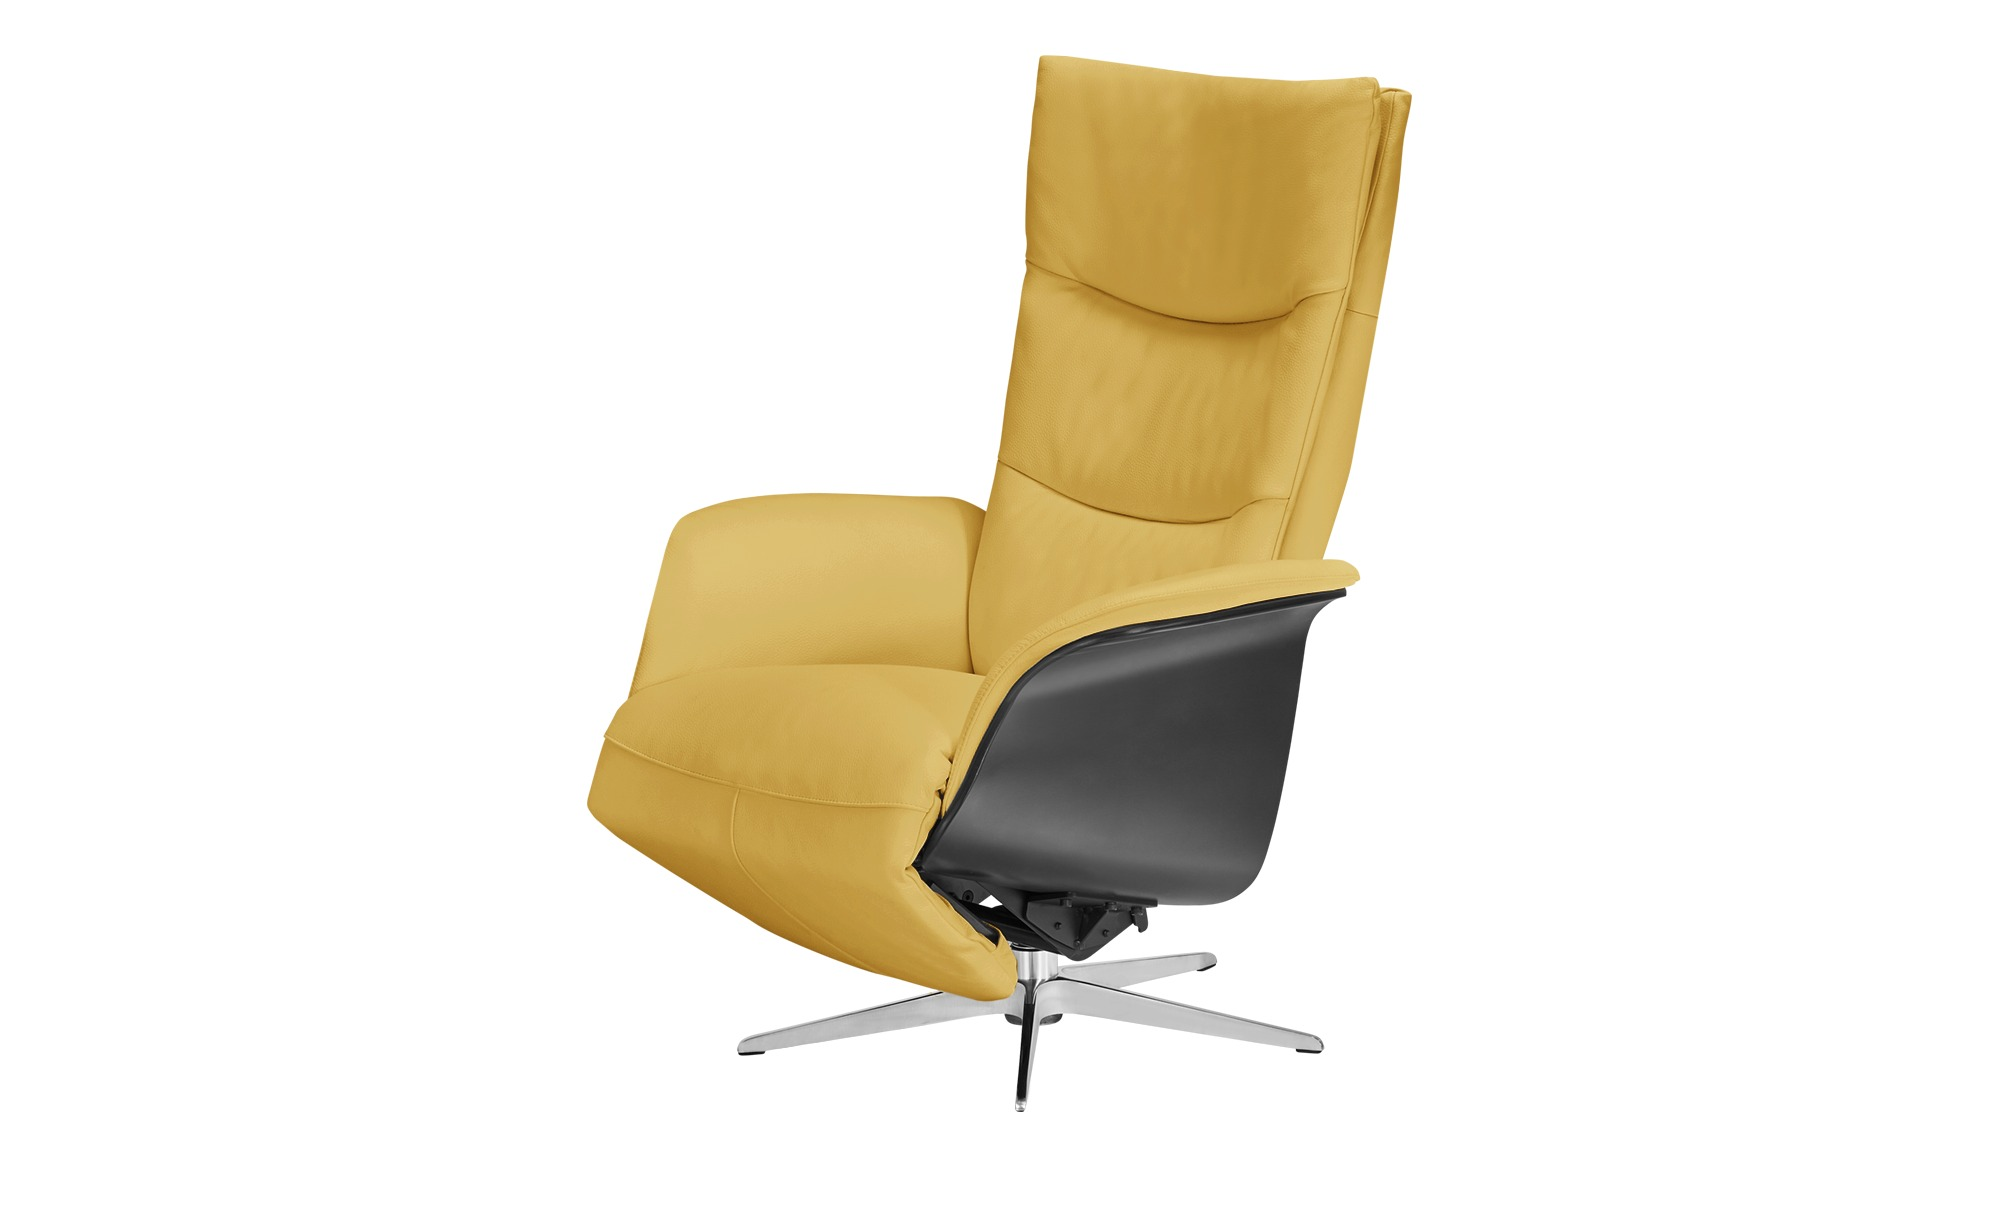 Nils Olsen Relaxsessel gelb - Leder Mika ¦ gelb ¦ Maße (cm): B: 77 H: 109 T: 82 Polstermöbel > Sessel > Fernsehsessel - Höffner